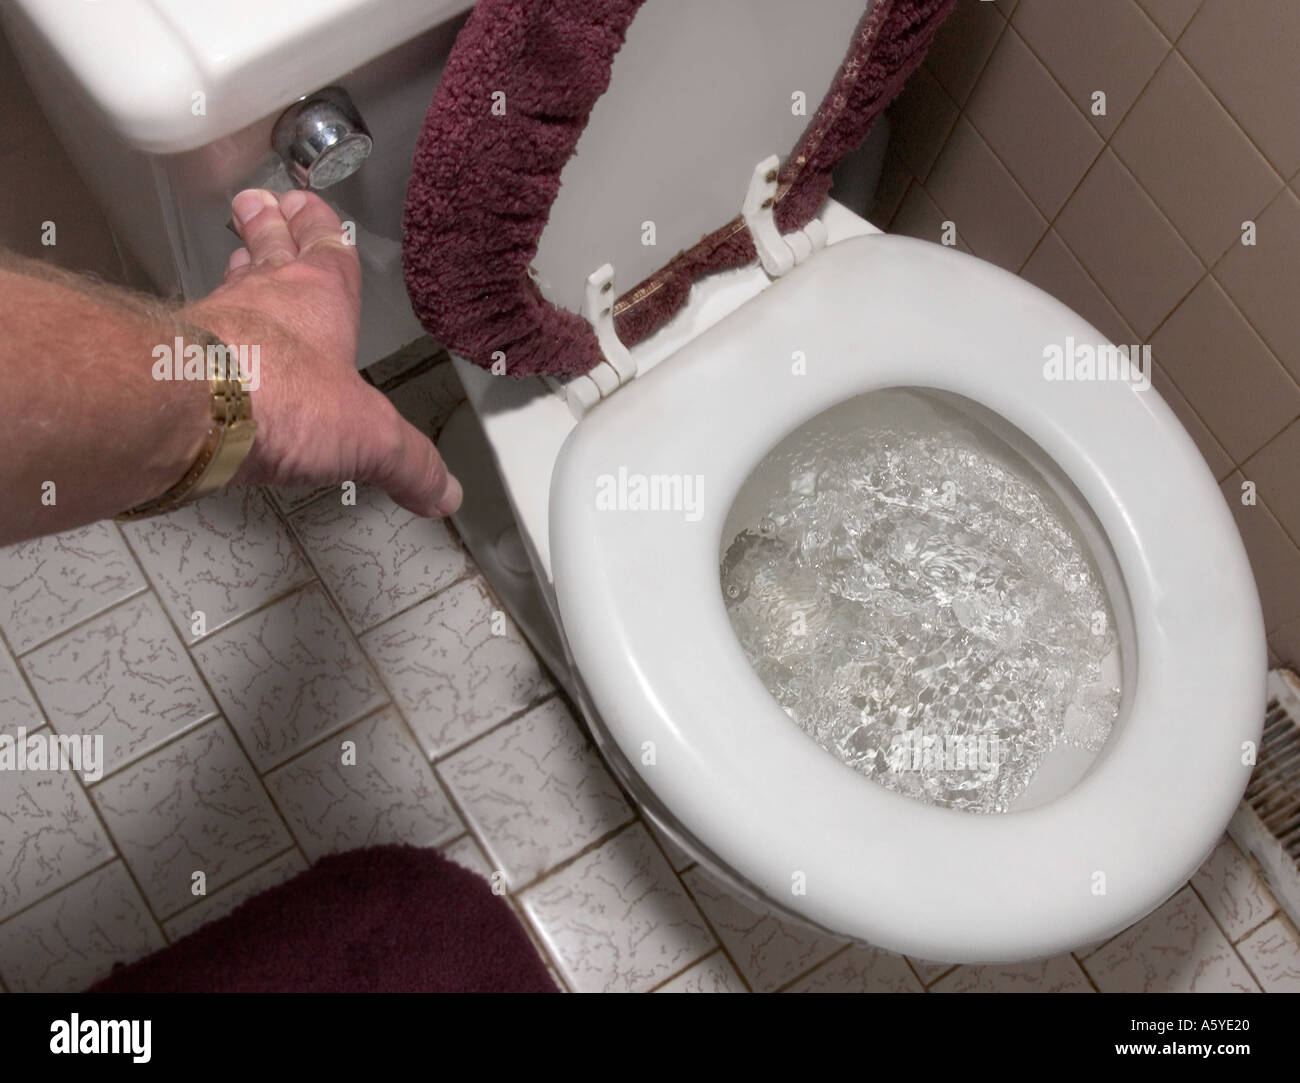 Flushing The Toilet Stock Photos & Flushing The Toilet Stock Images ...